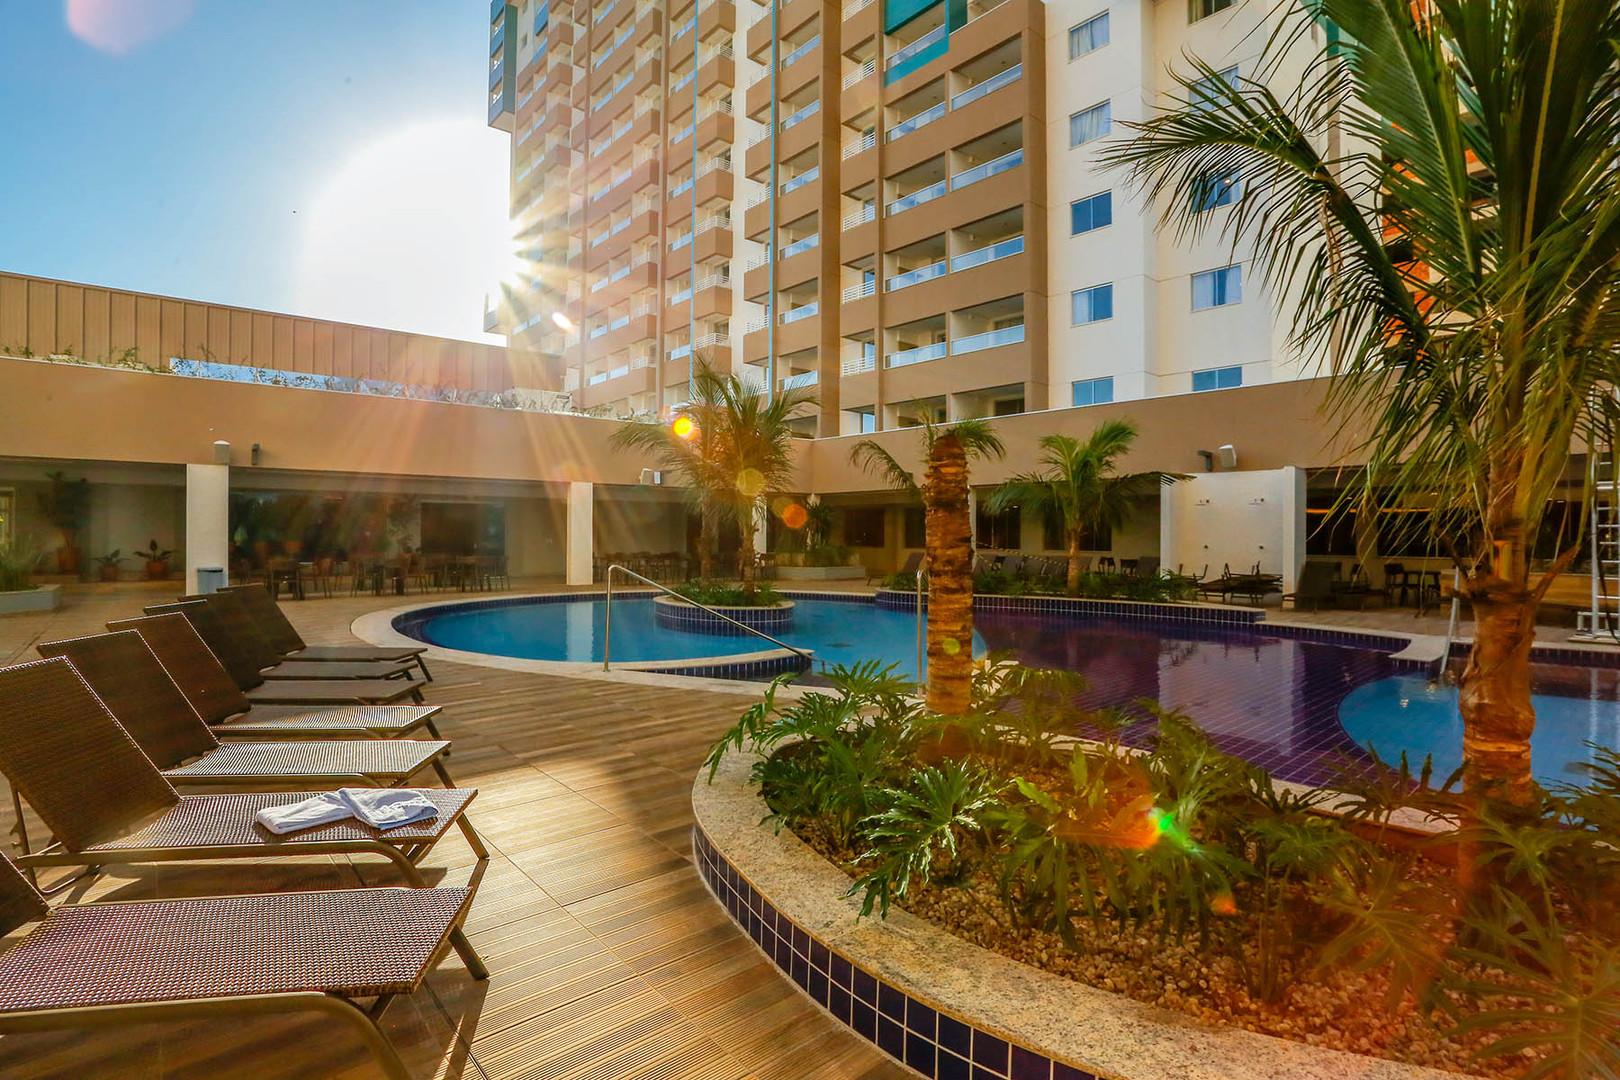 Enjoy-Olimpia-Park-Resort-1.jpg